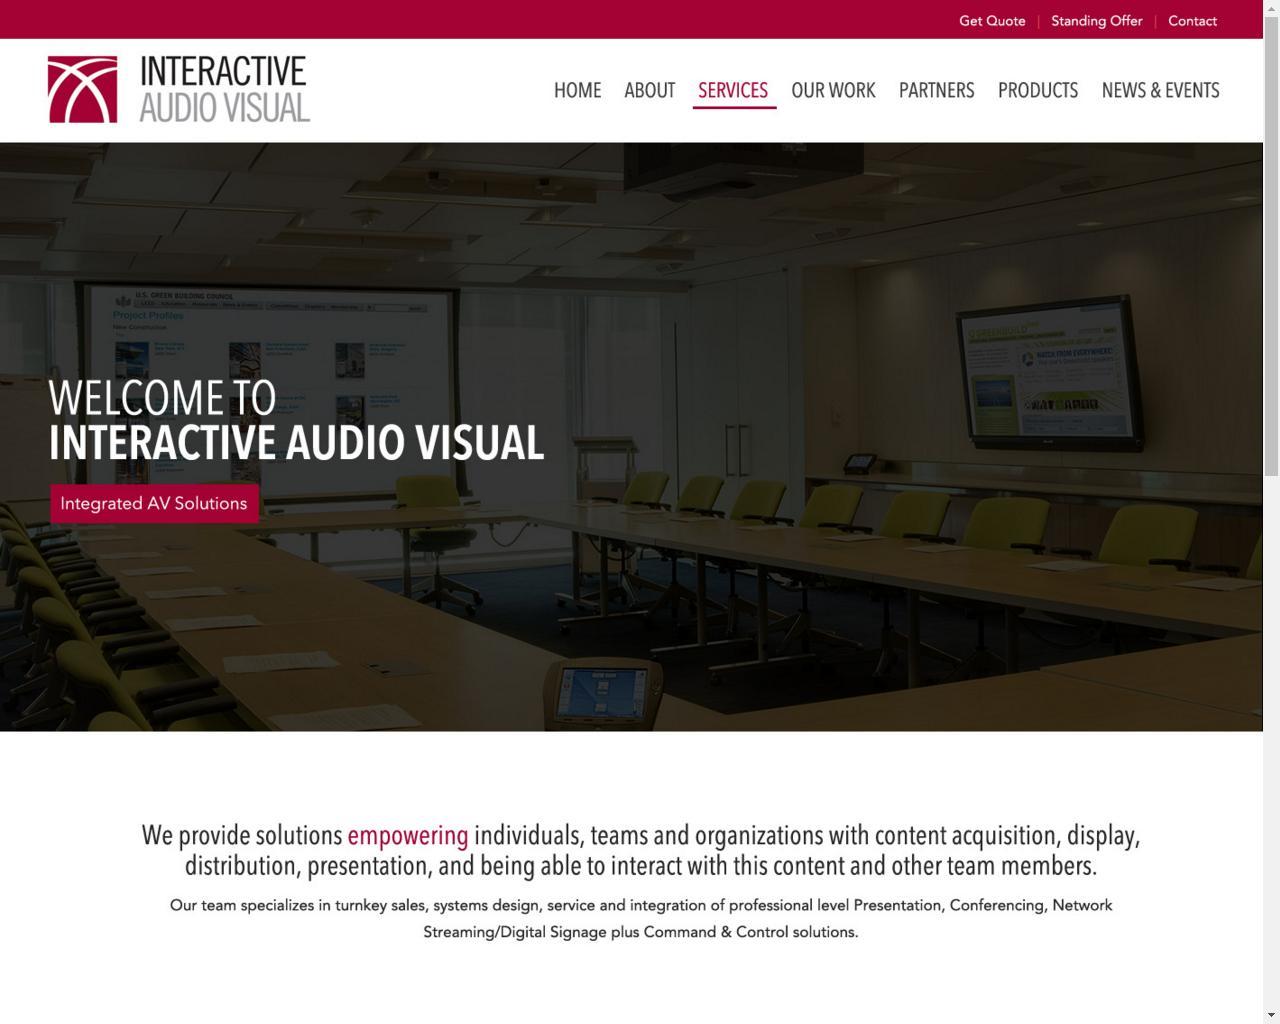 Interactive Audio Visual